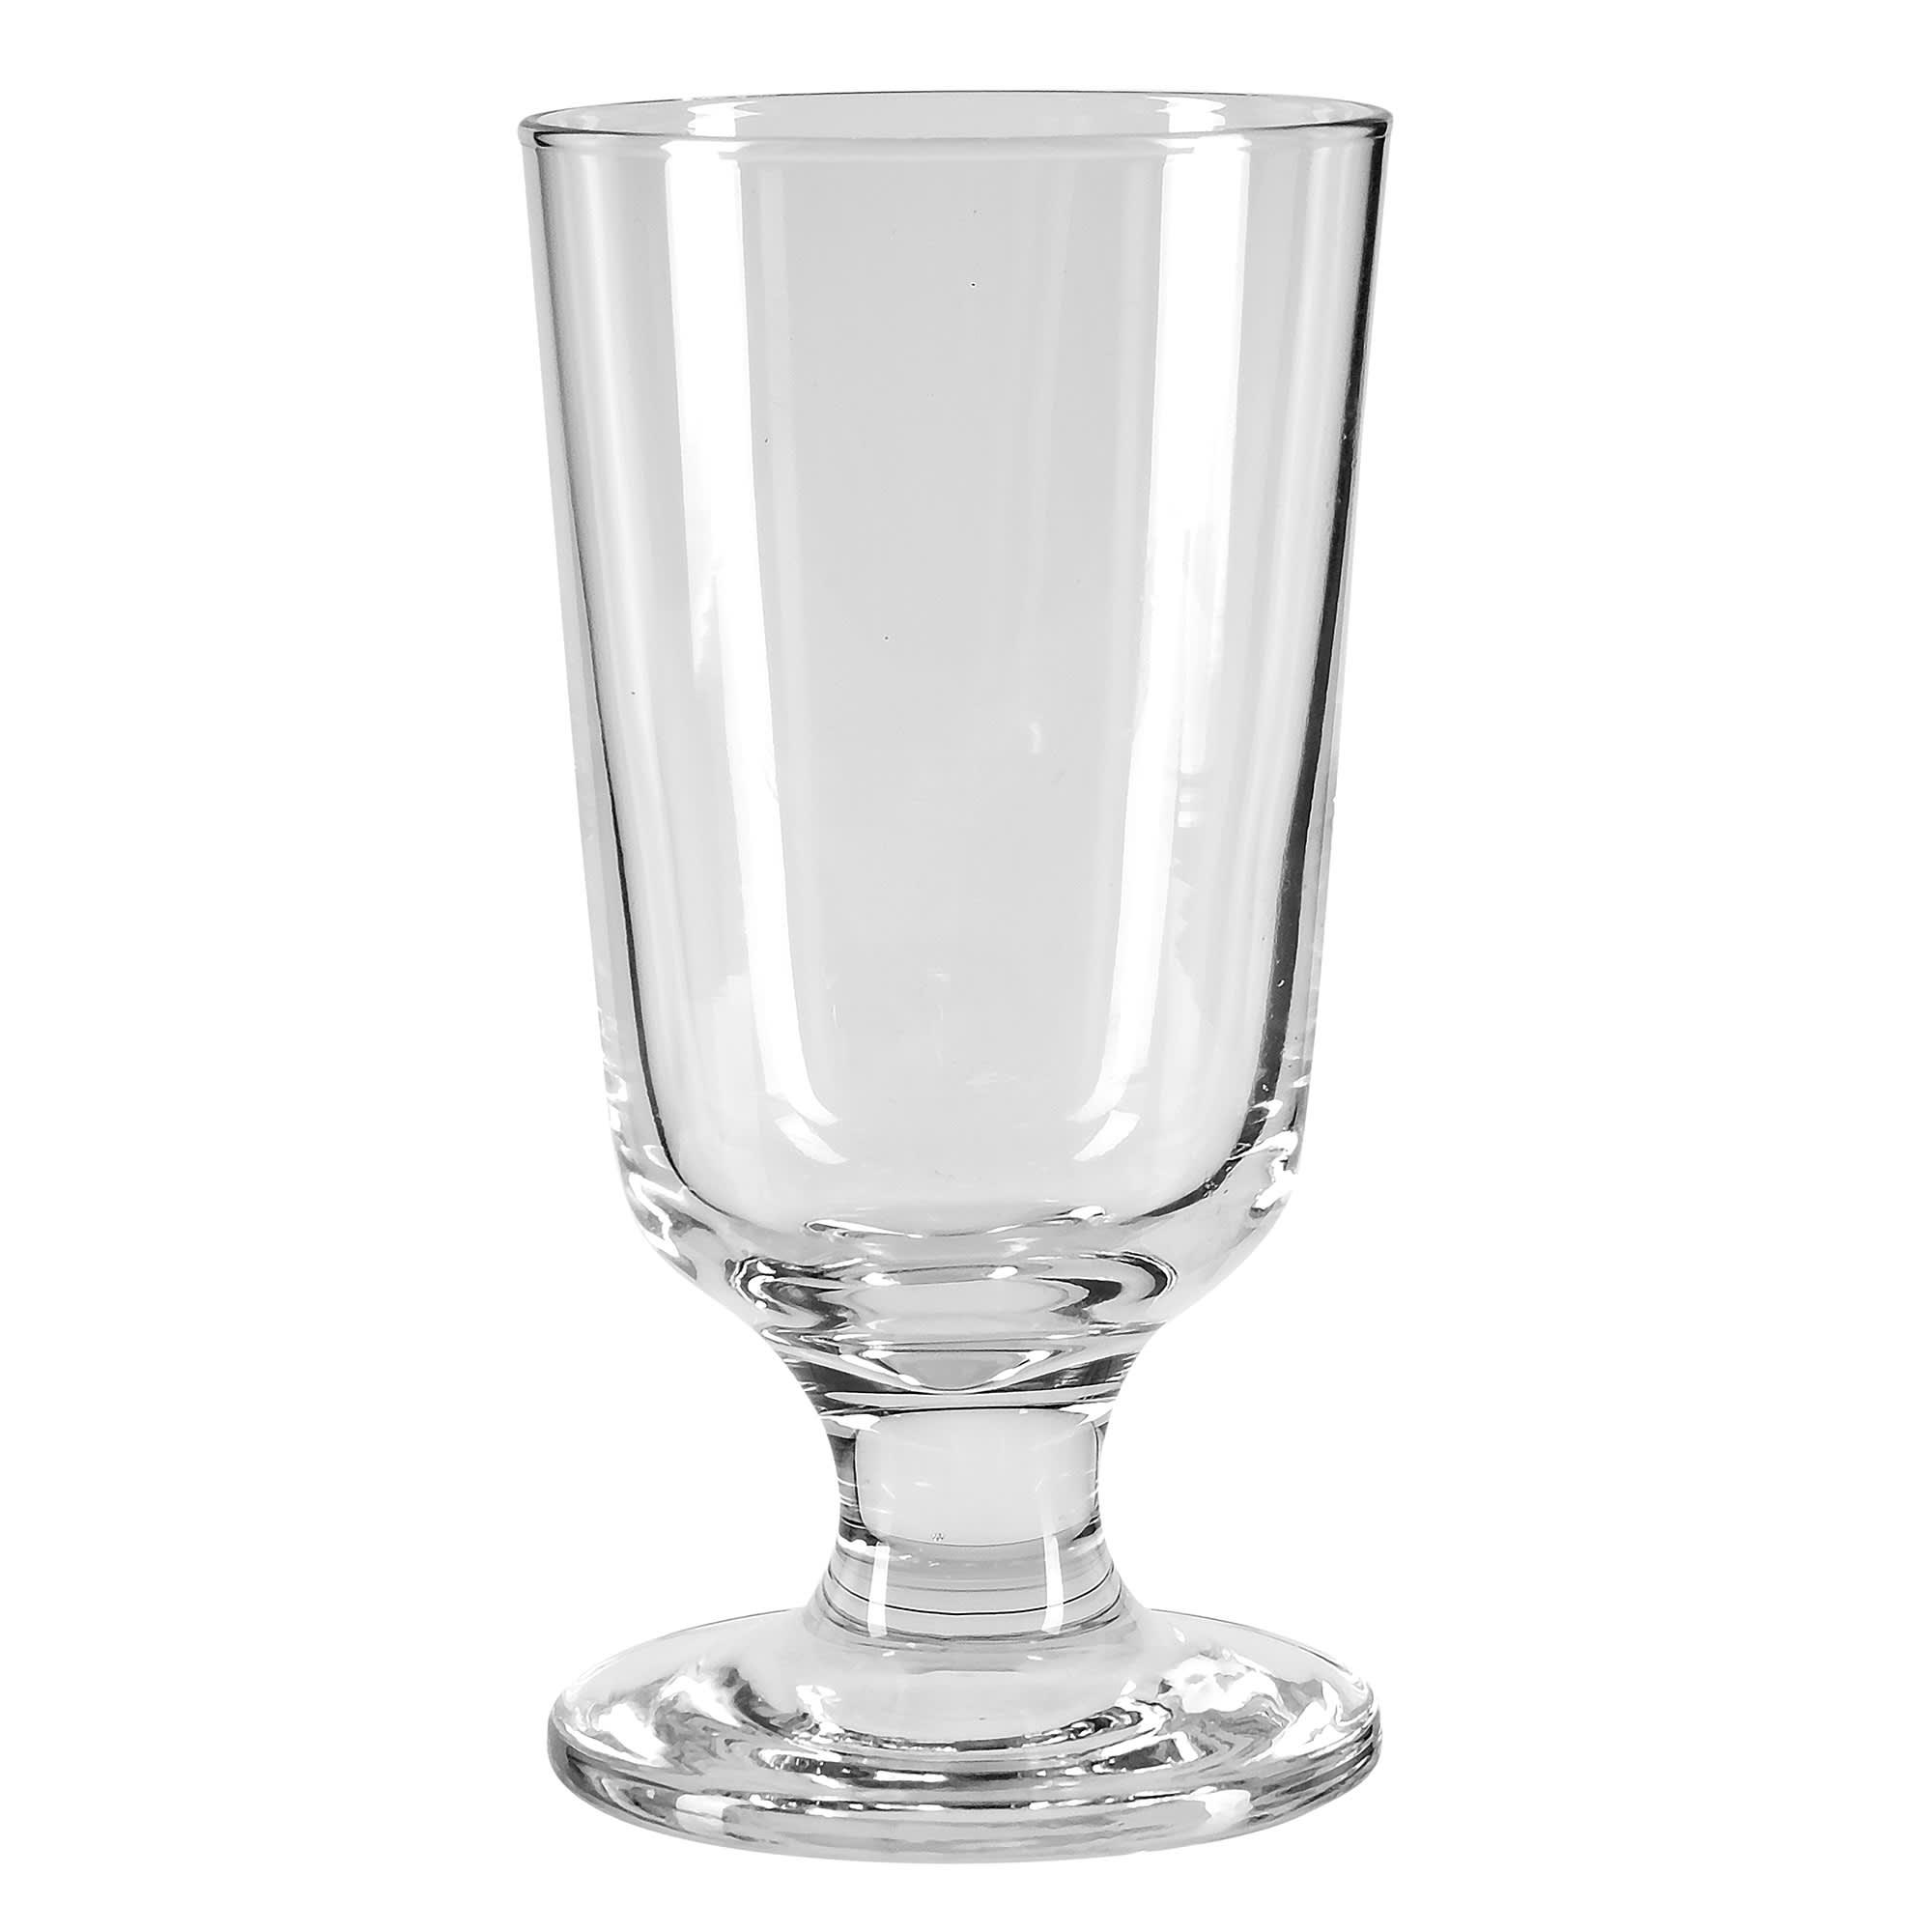 Anchor 2908M Excellency Hi - Ball Glass, 8 oz